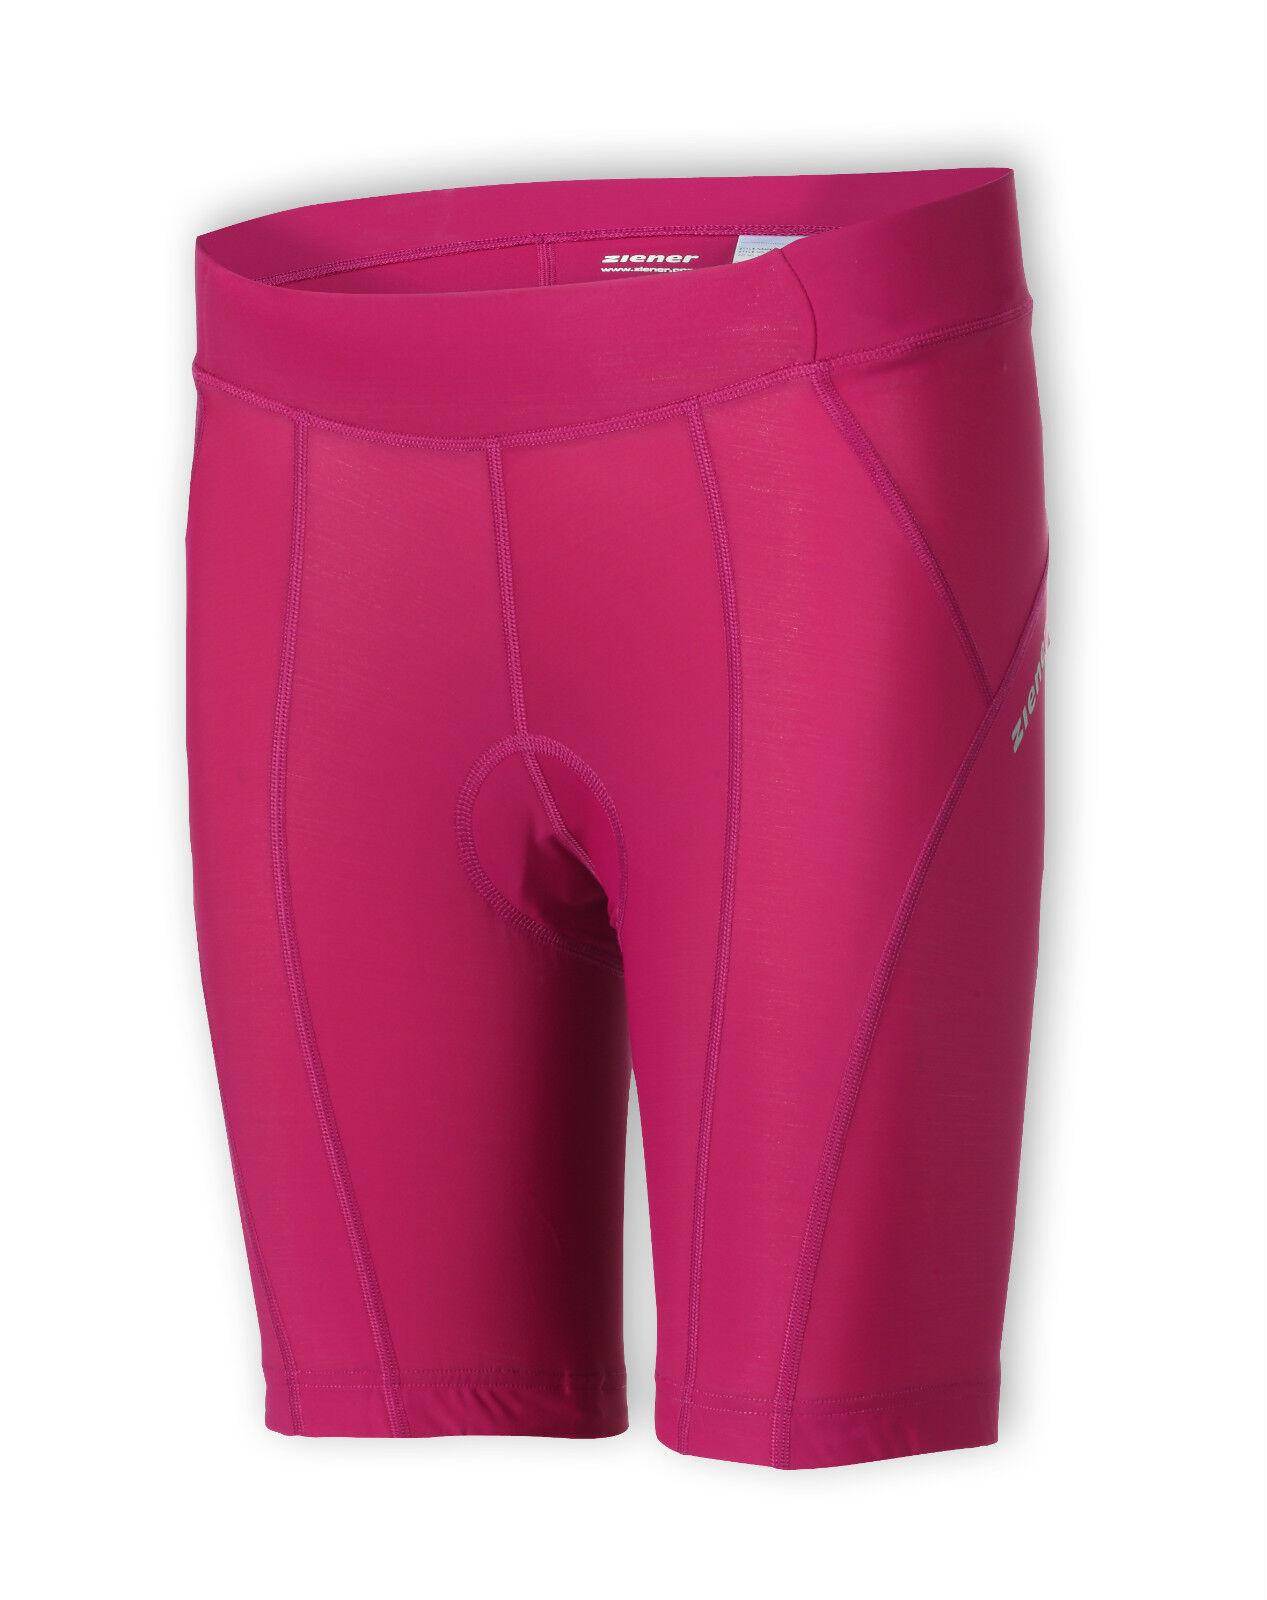 ZIENER Women's Bike Bike Pants Tight chocci Raspberry 203 NEW